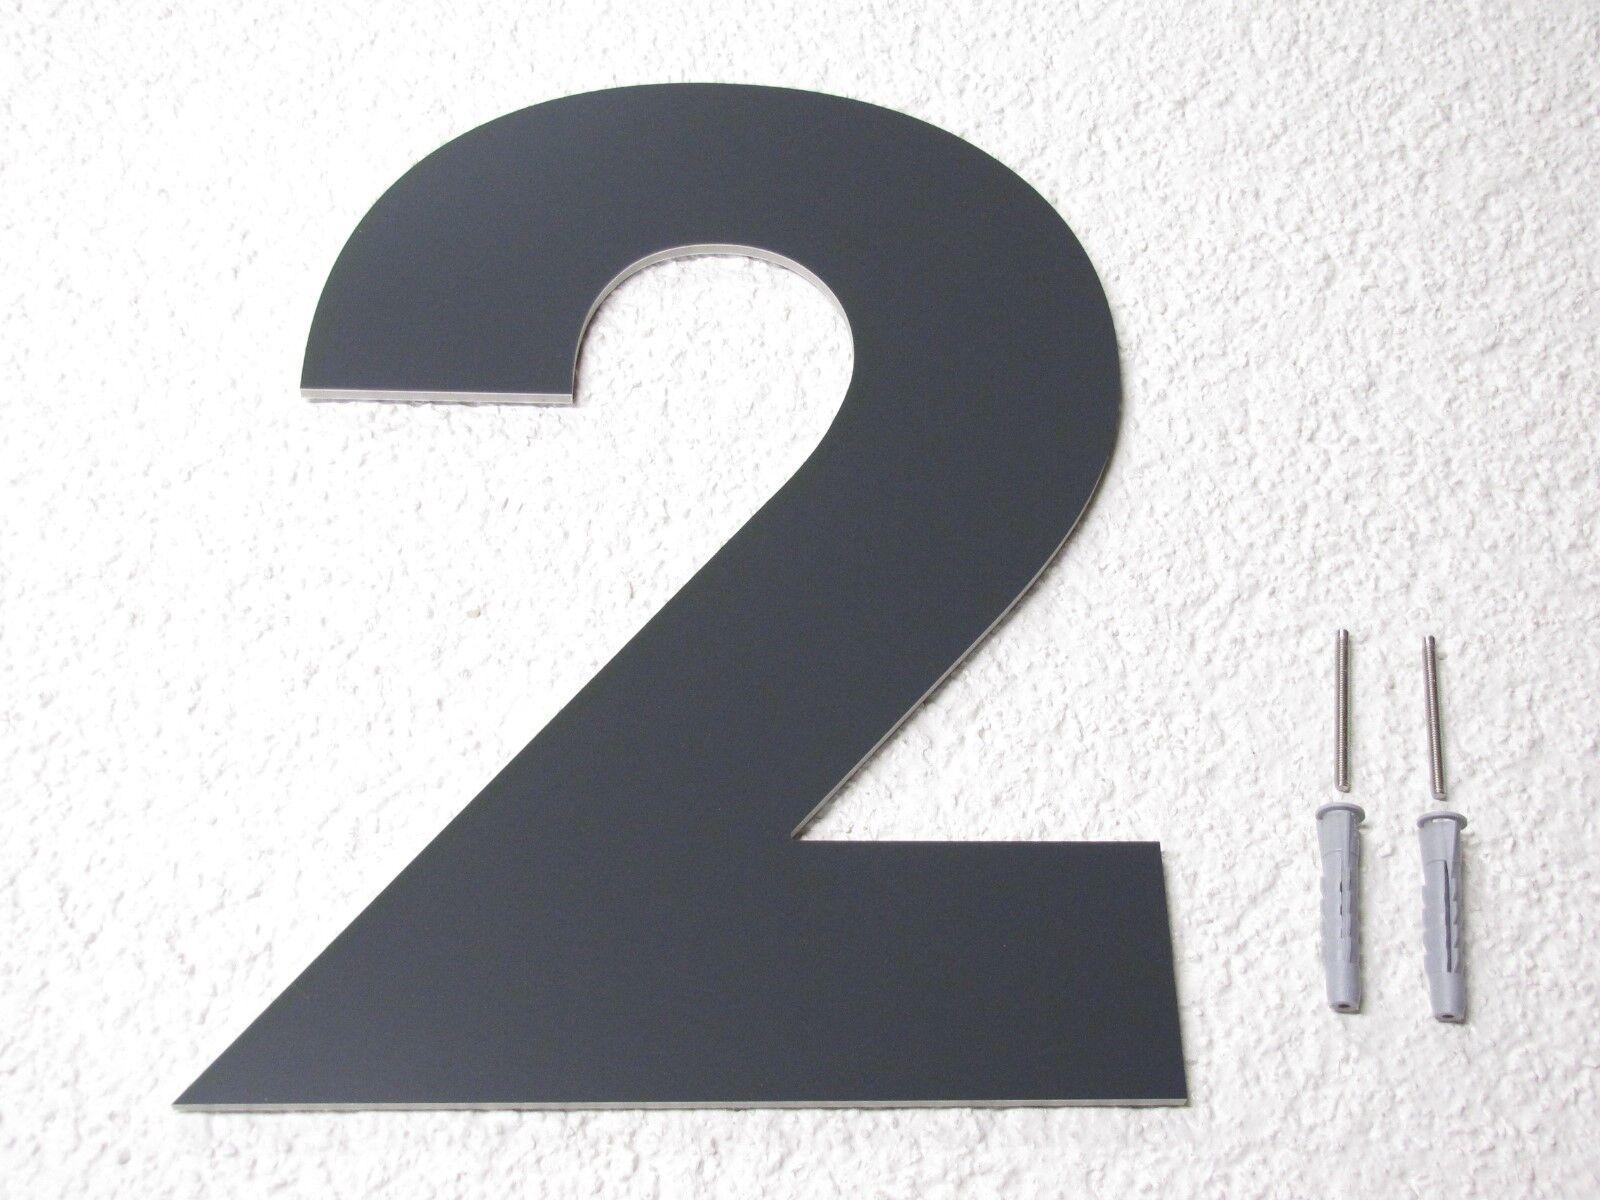 Hausnummer Anthrazit RAL RAL RAL 7016 20 cm hoch 1 2 3 4 5 6 7 8 9 0 a b c d e f g h | 2019  | Good Design  | Schön und charmant  79535c